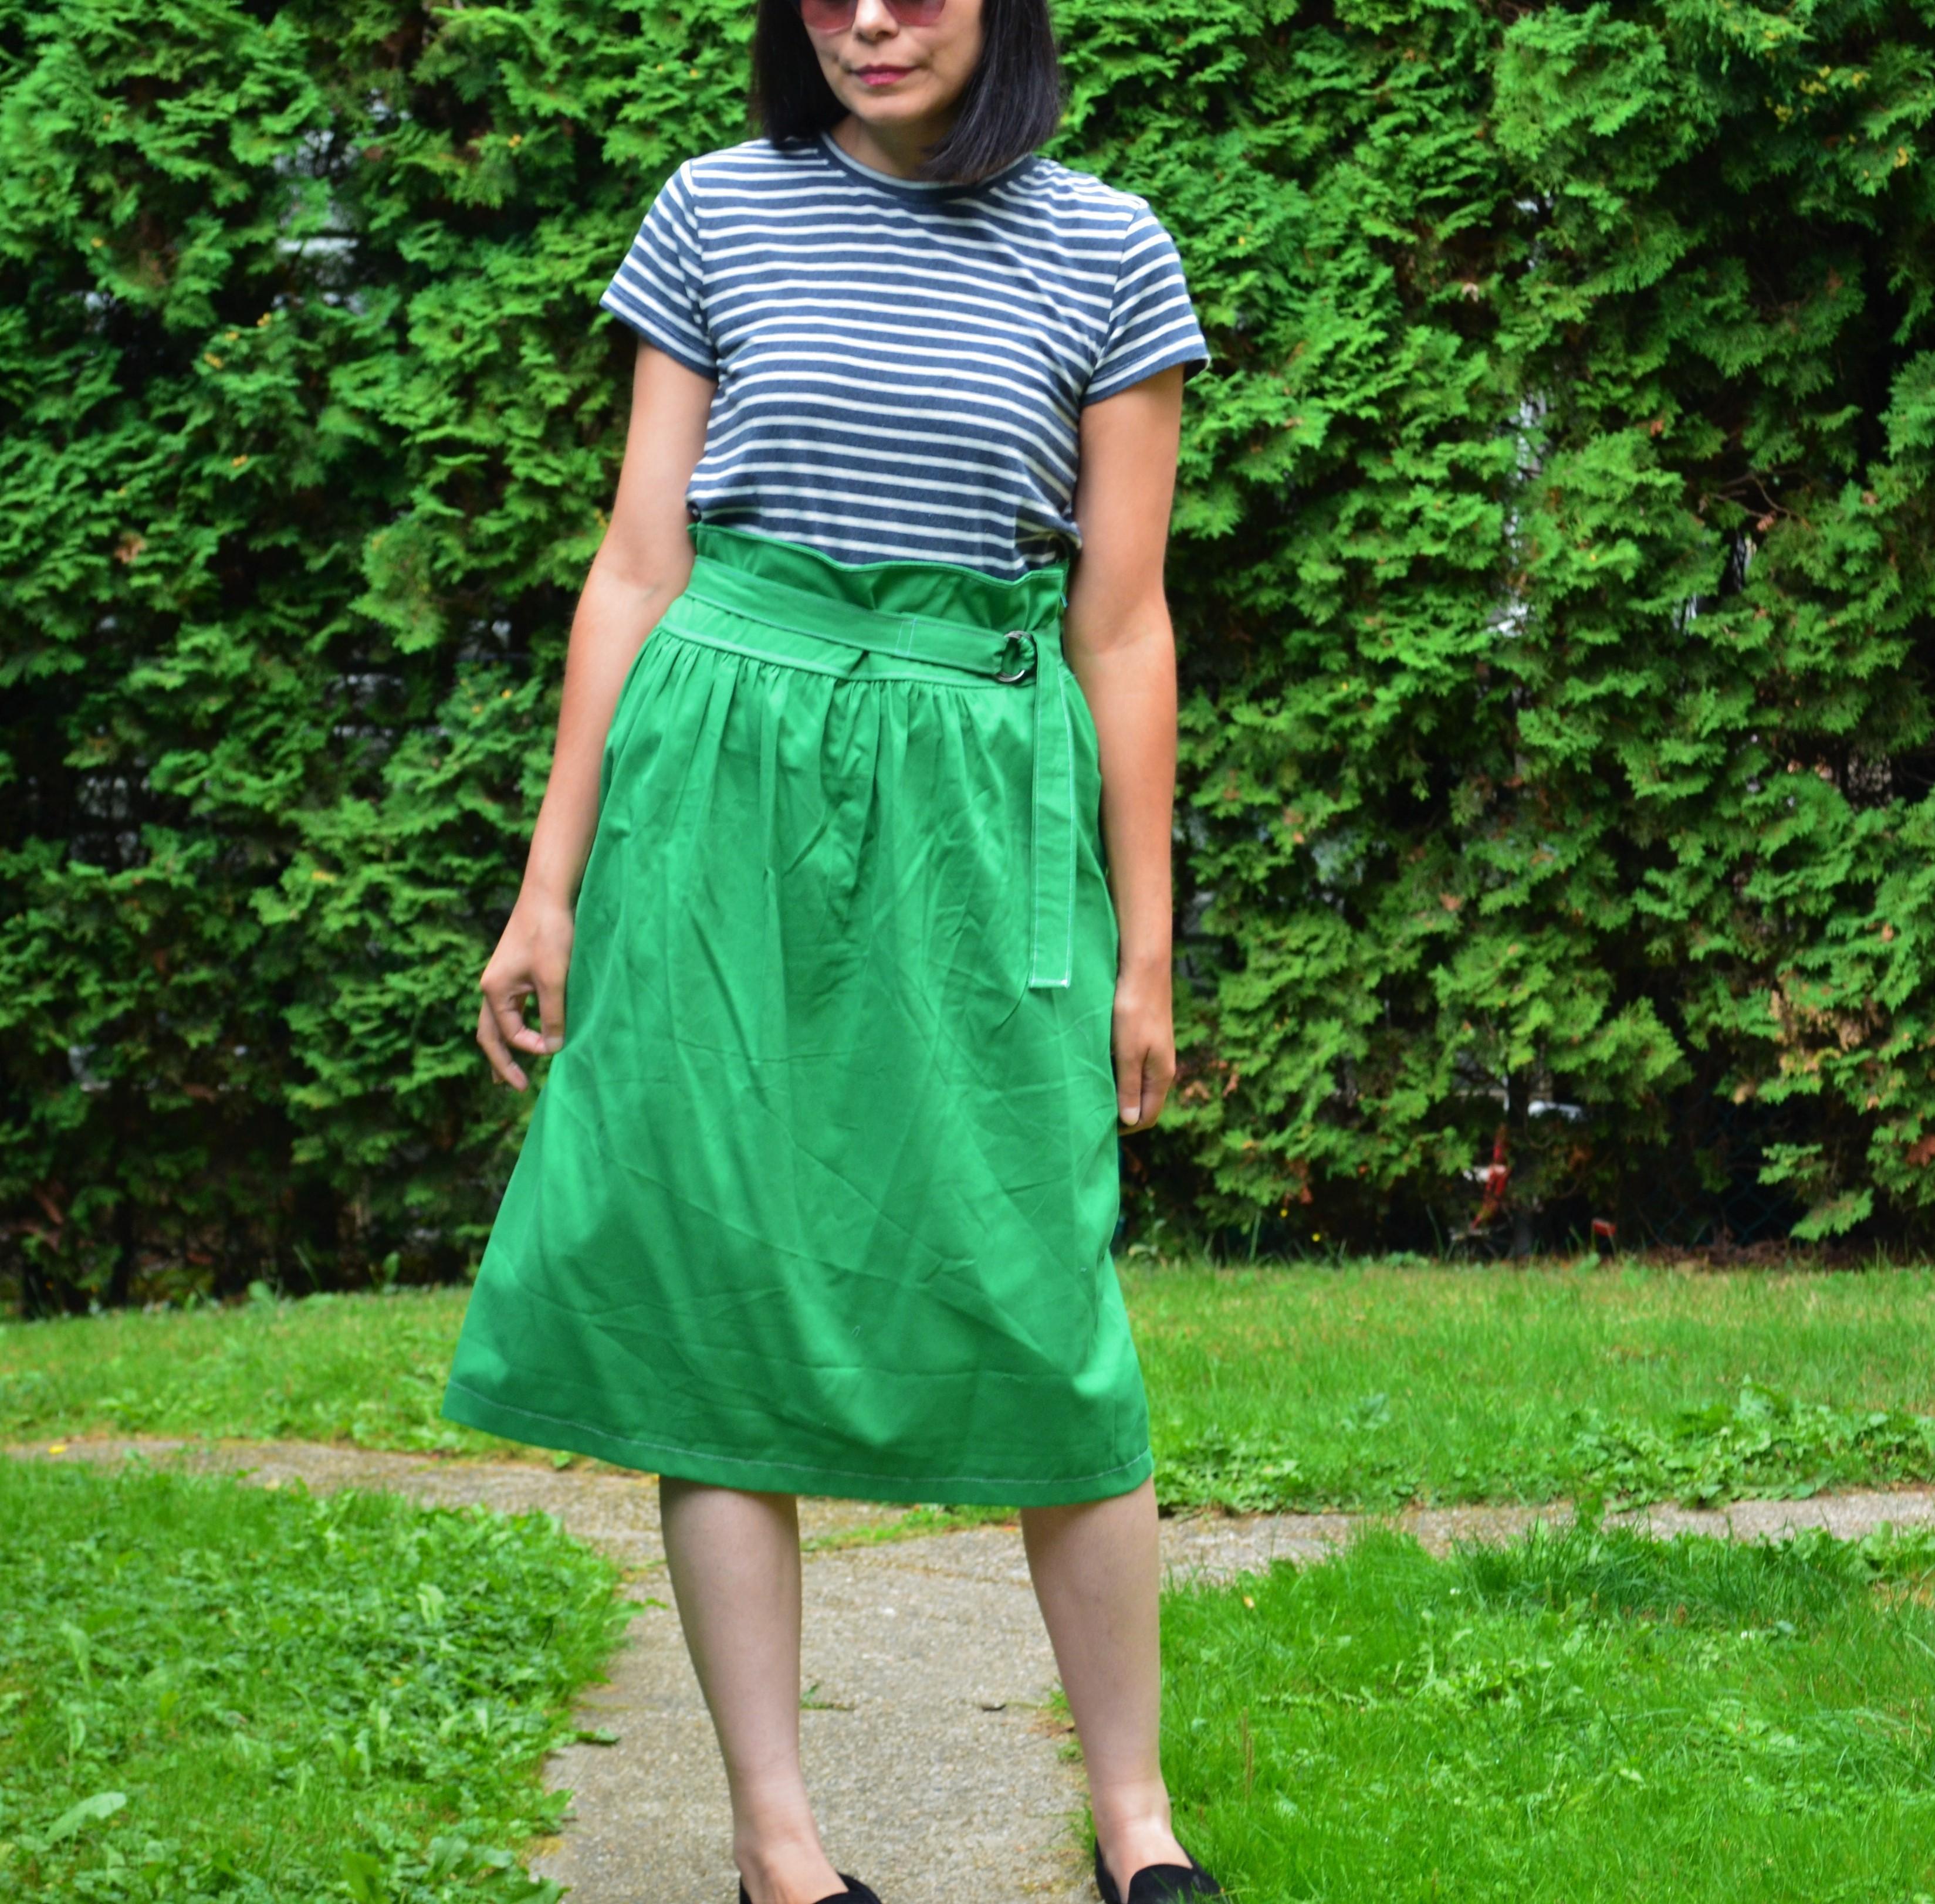 FREE PATTERN ALERT: The Paperbag Skirt